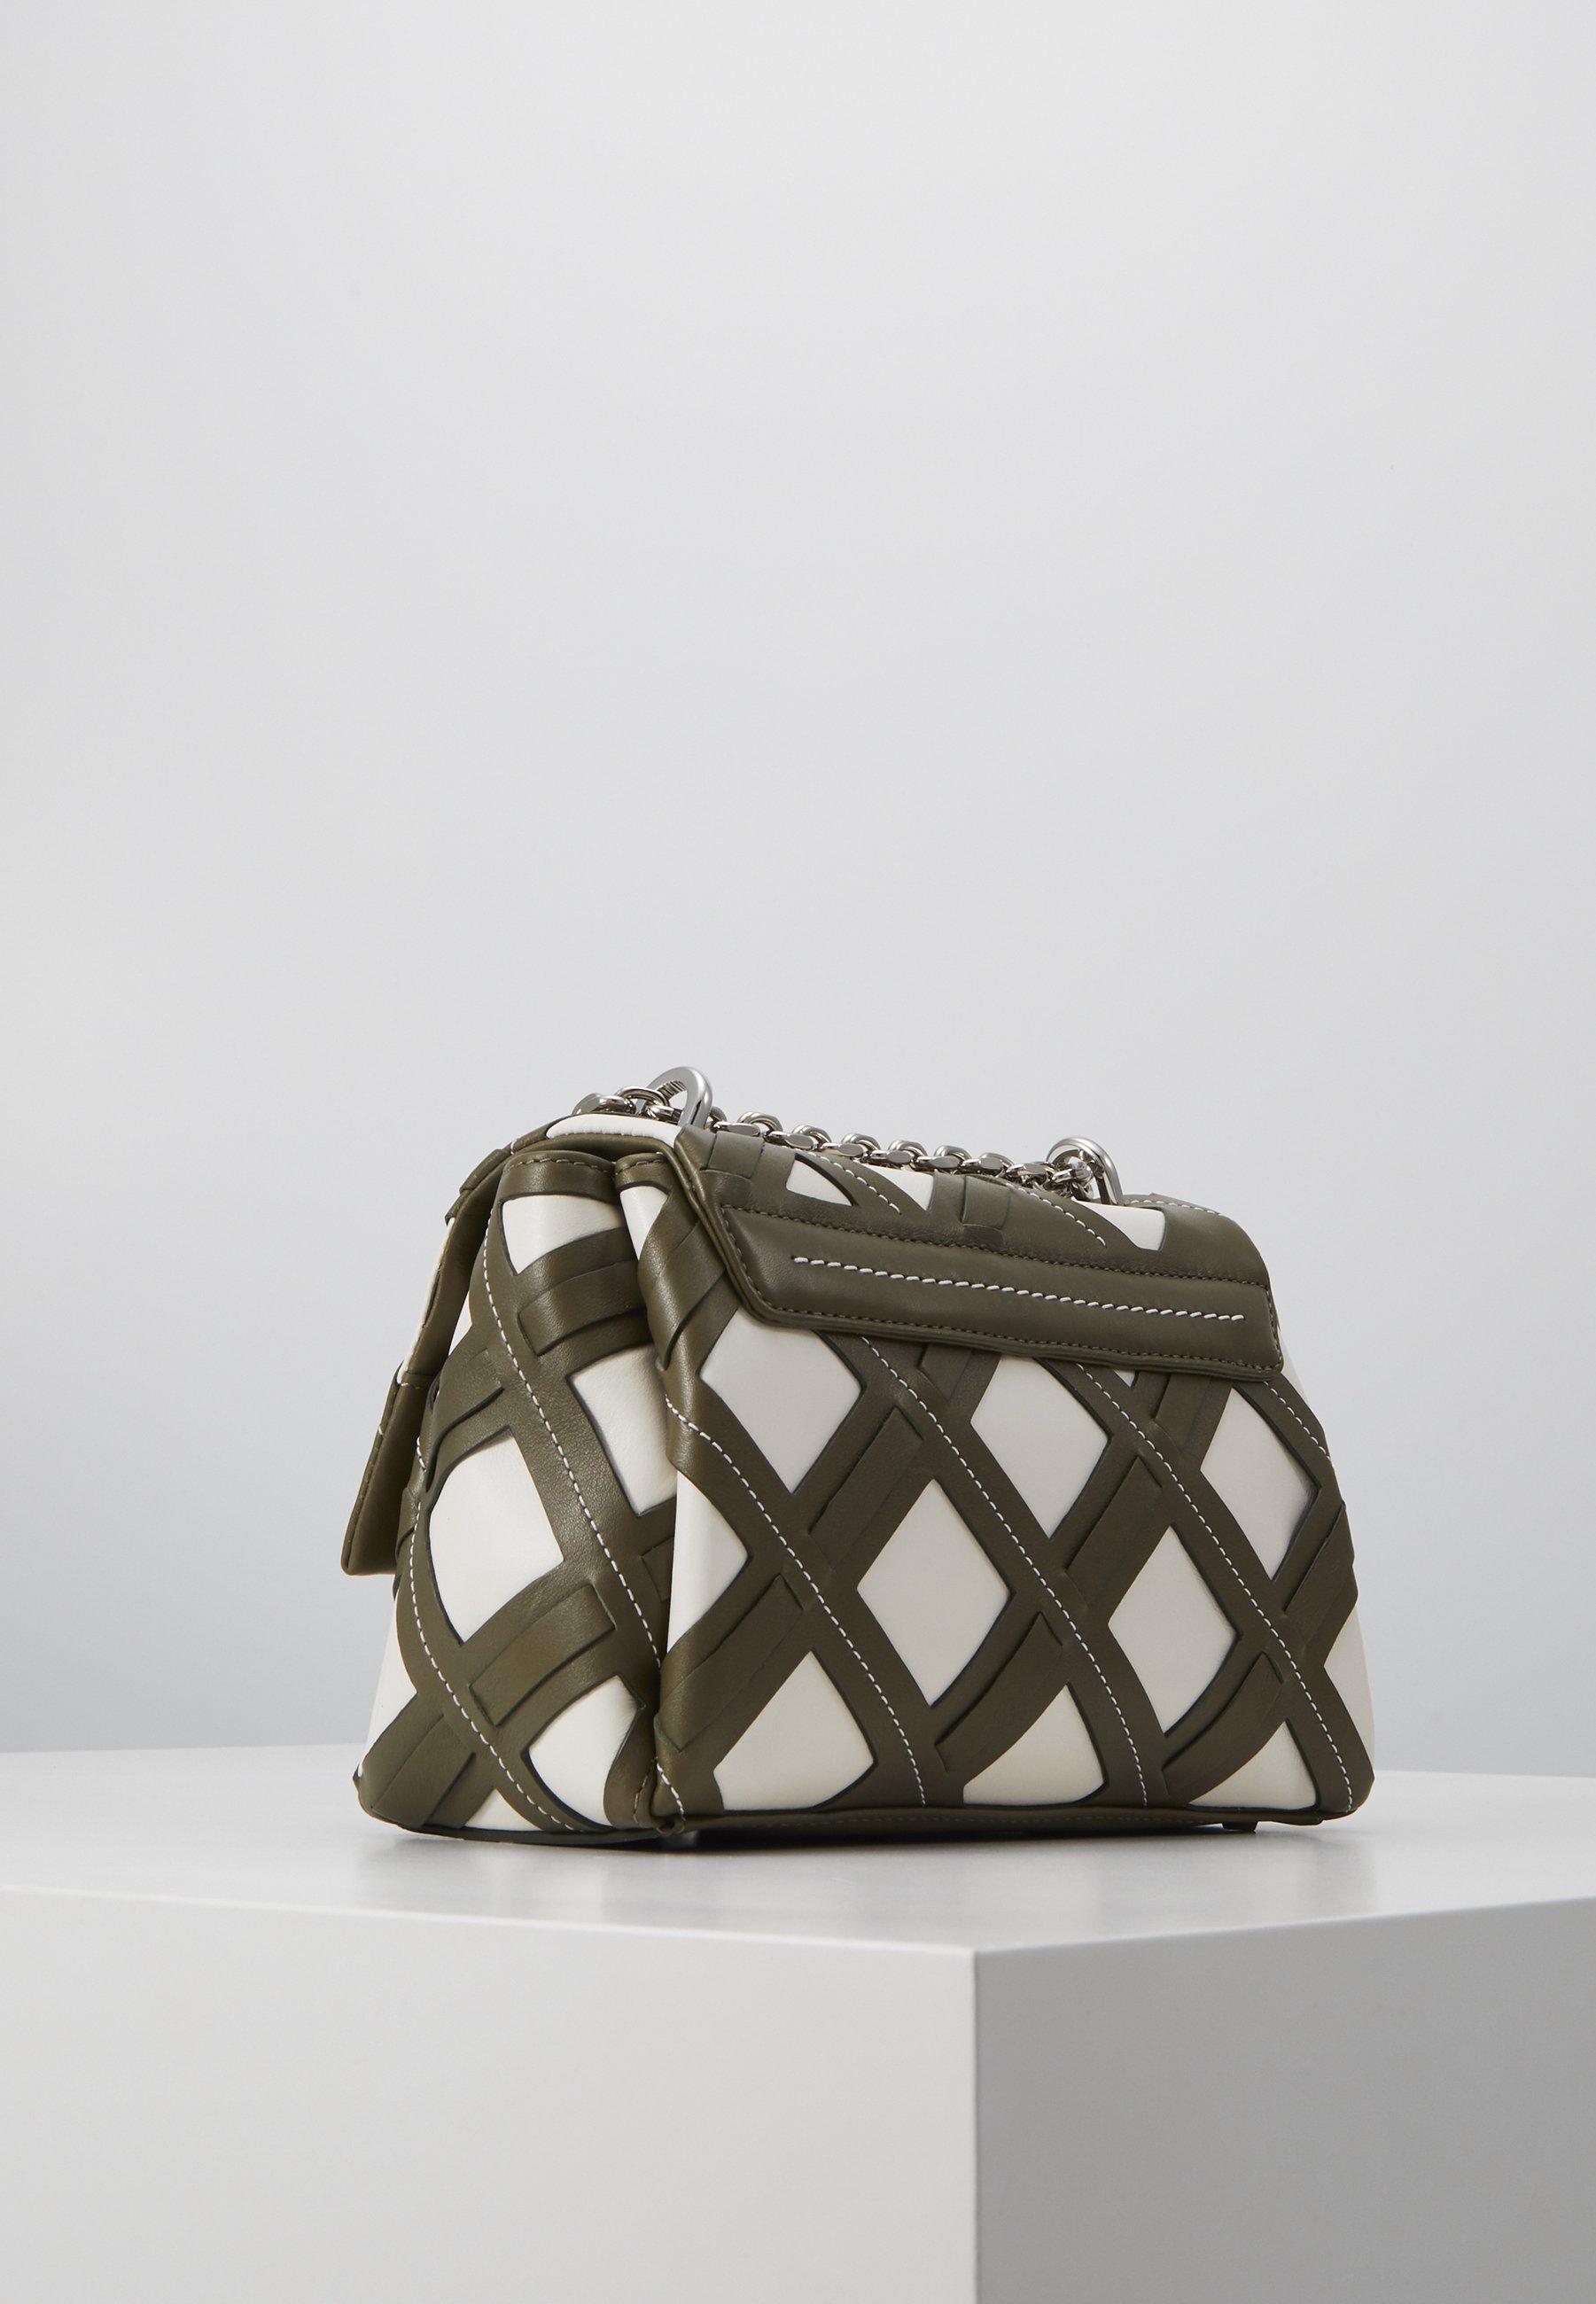 3.1 Phillip Lim Alix Soft Chain Cutout - Across Body Bag Military Multi